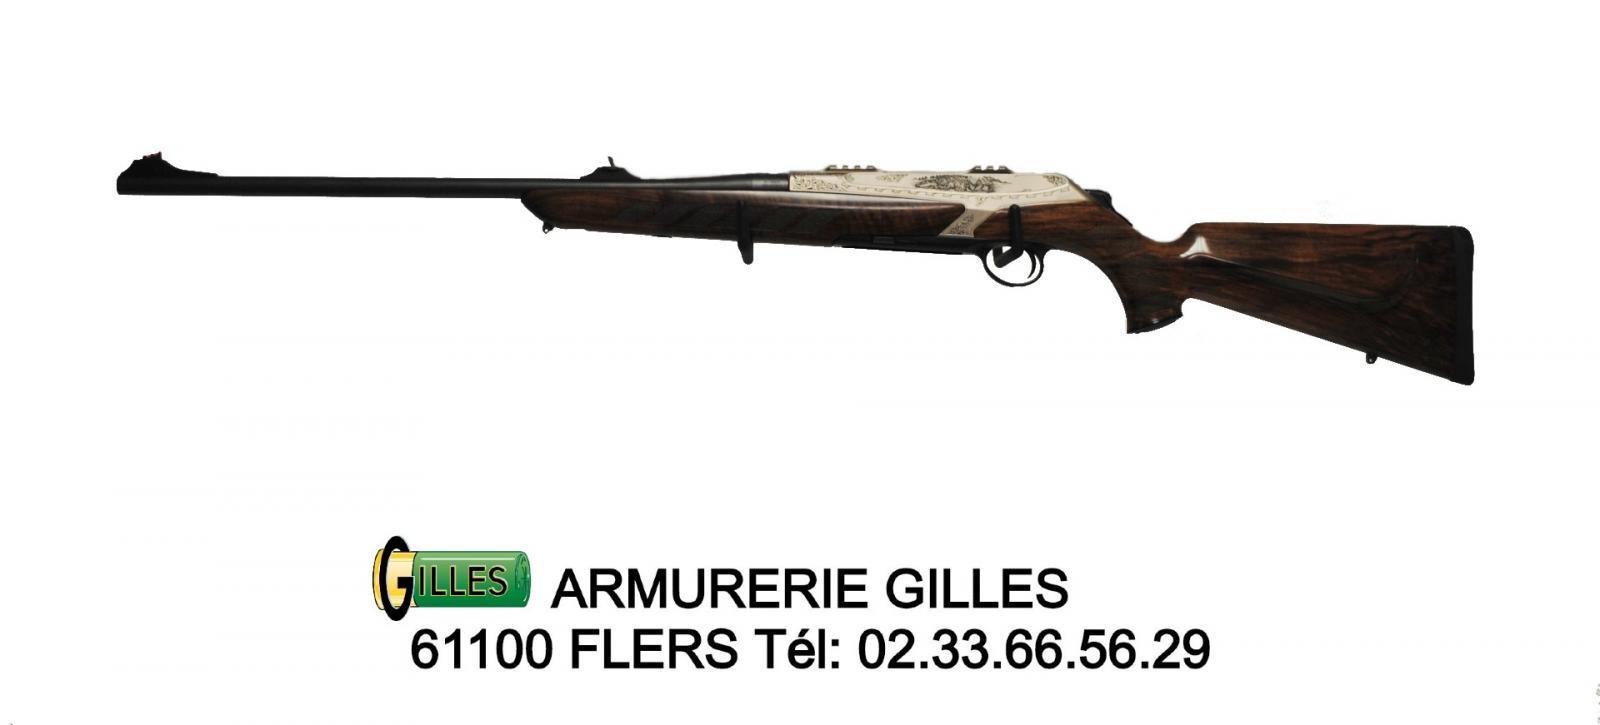 Carabine MERKEL RX HÉLIX WILD BOAR Cal 300WMG